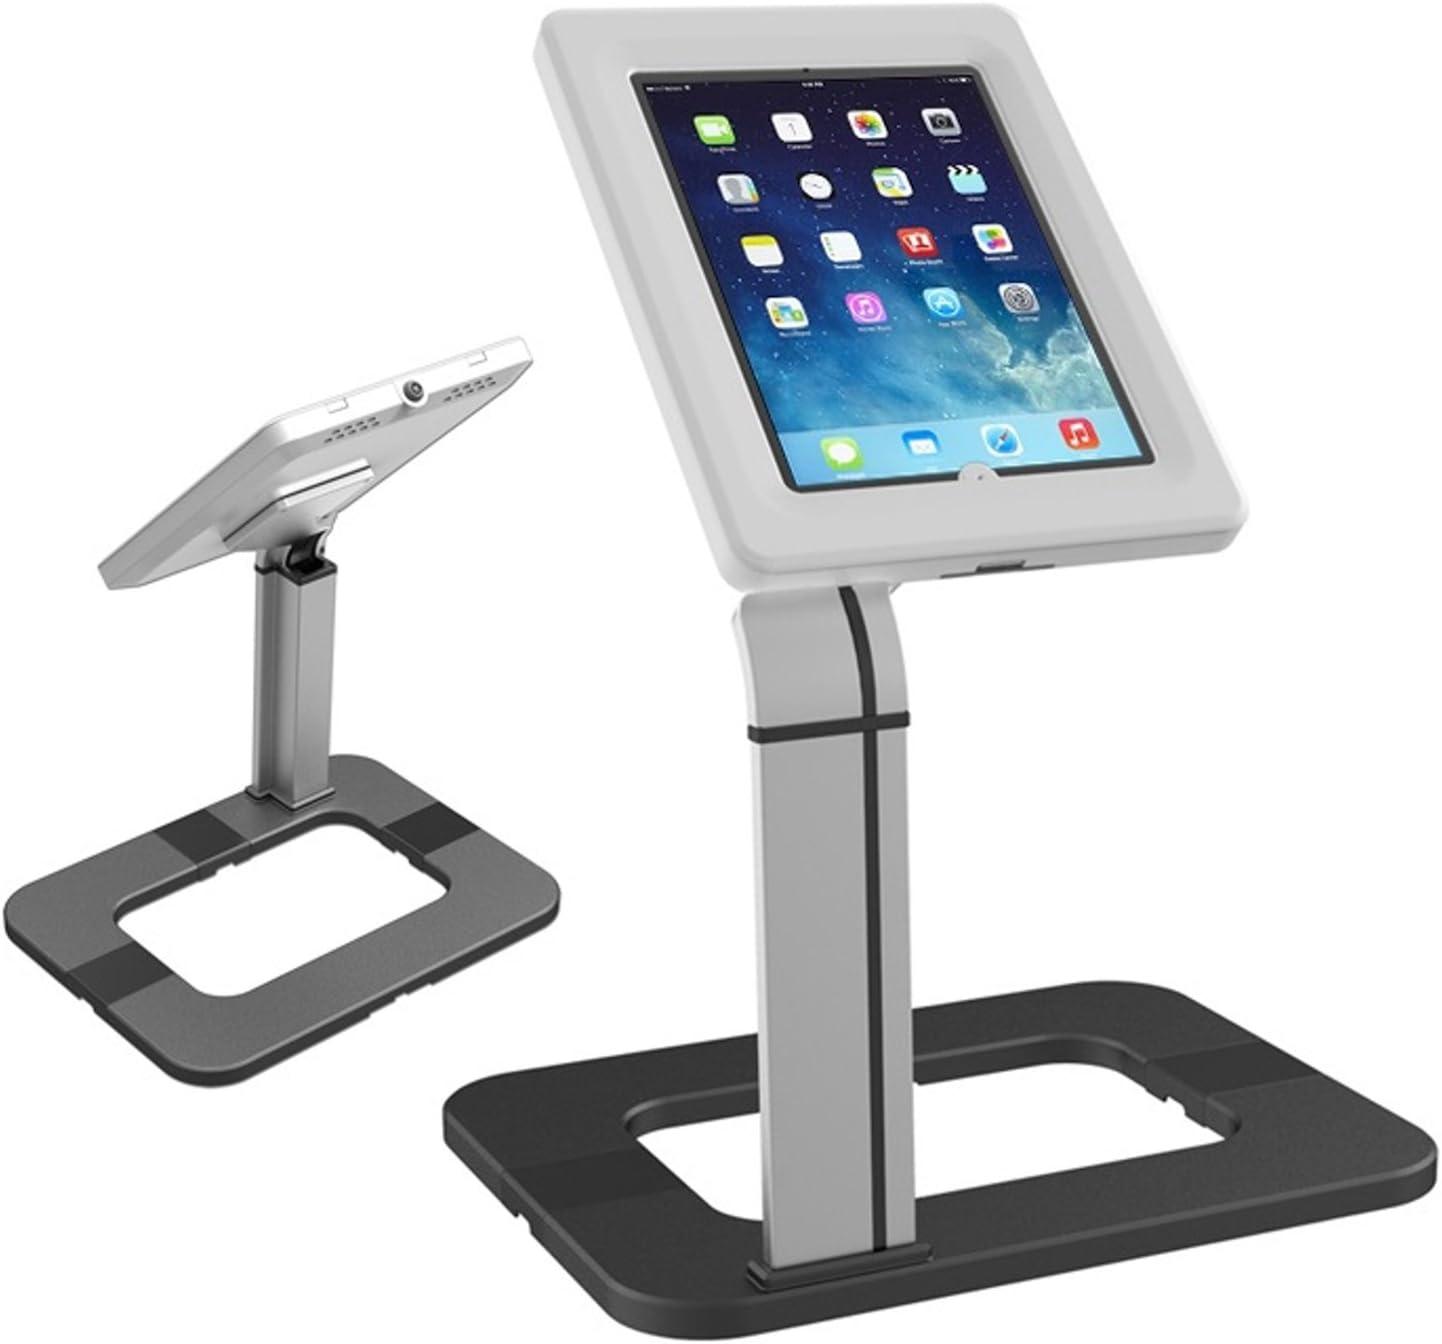 "Maclean MC-644 - Soporte de sobremesa para Tablet iPad 2/3/4/Air Galaxy 9.7""-10.1"" con Estuche antirrobo"